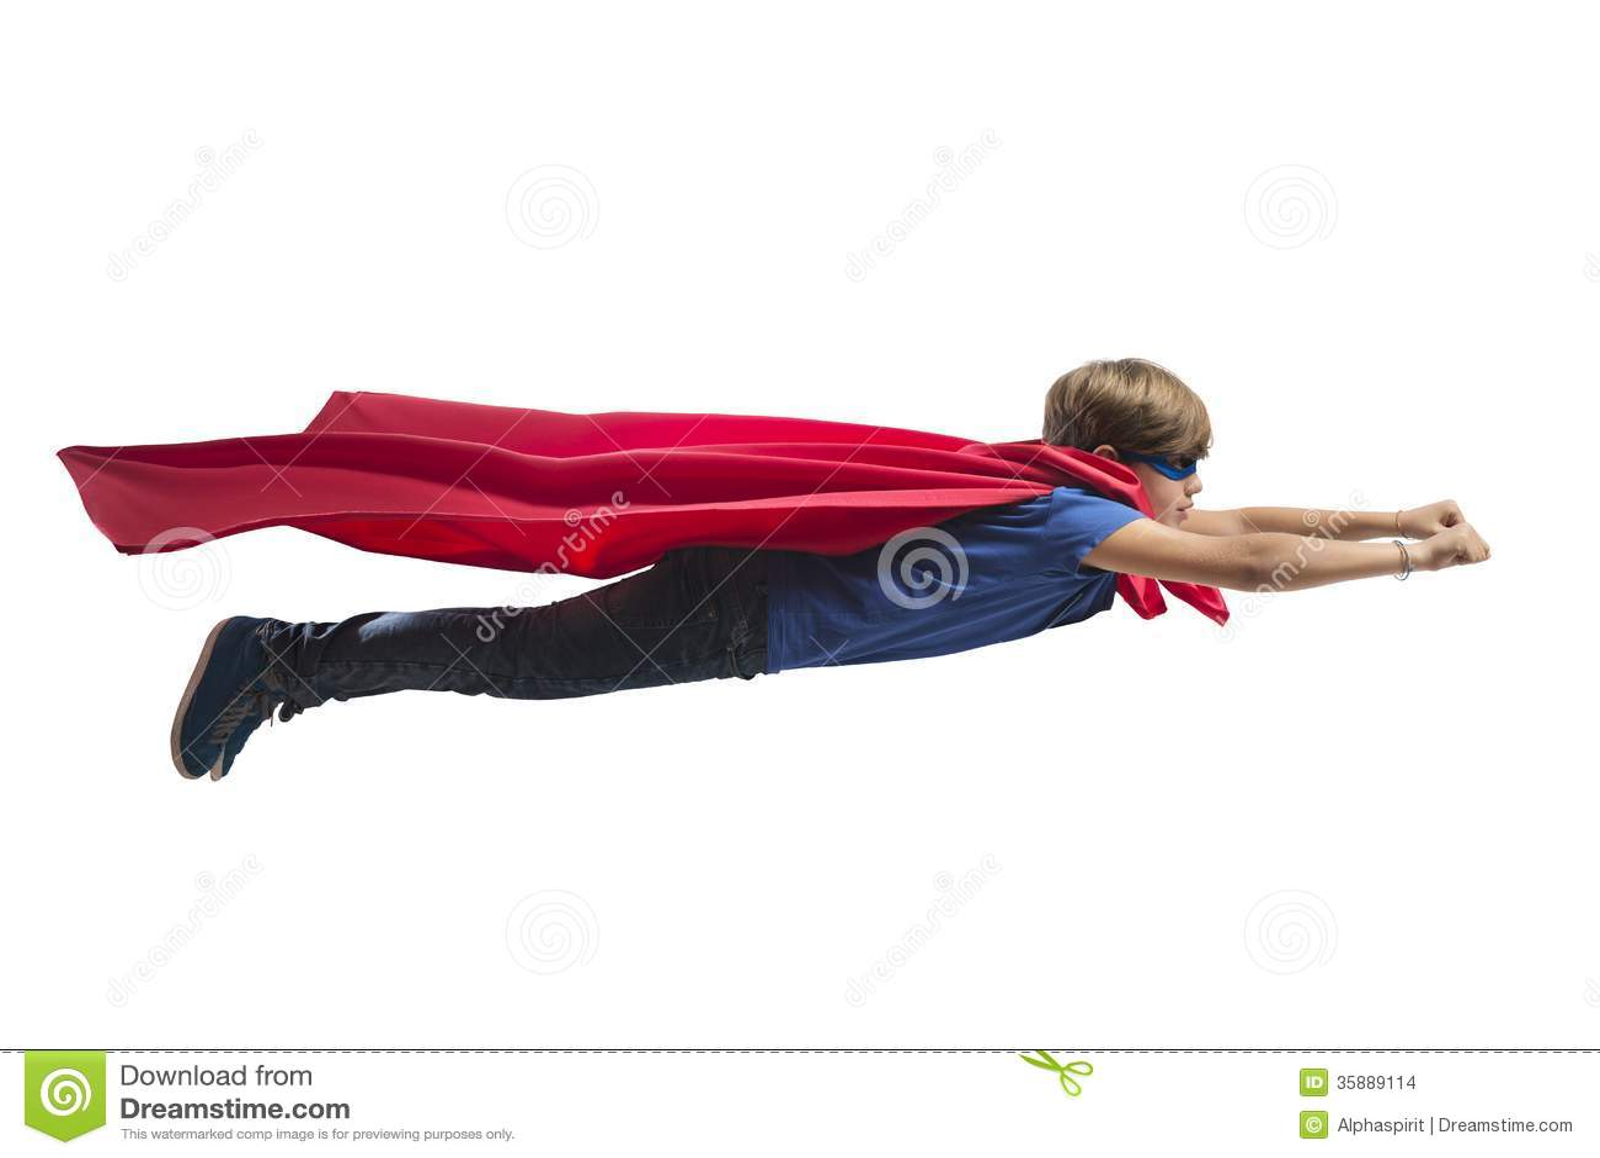 Superhero Kid Stock Images - Image: 35889114